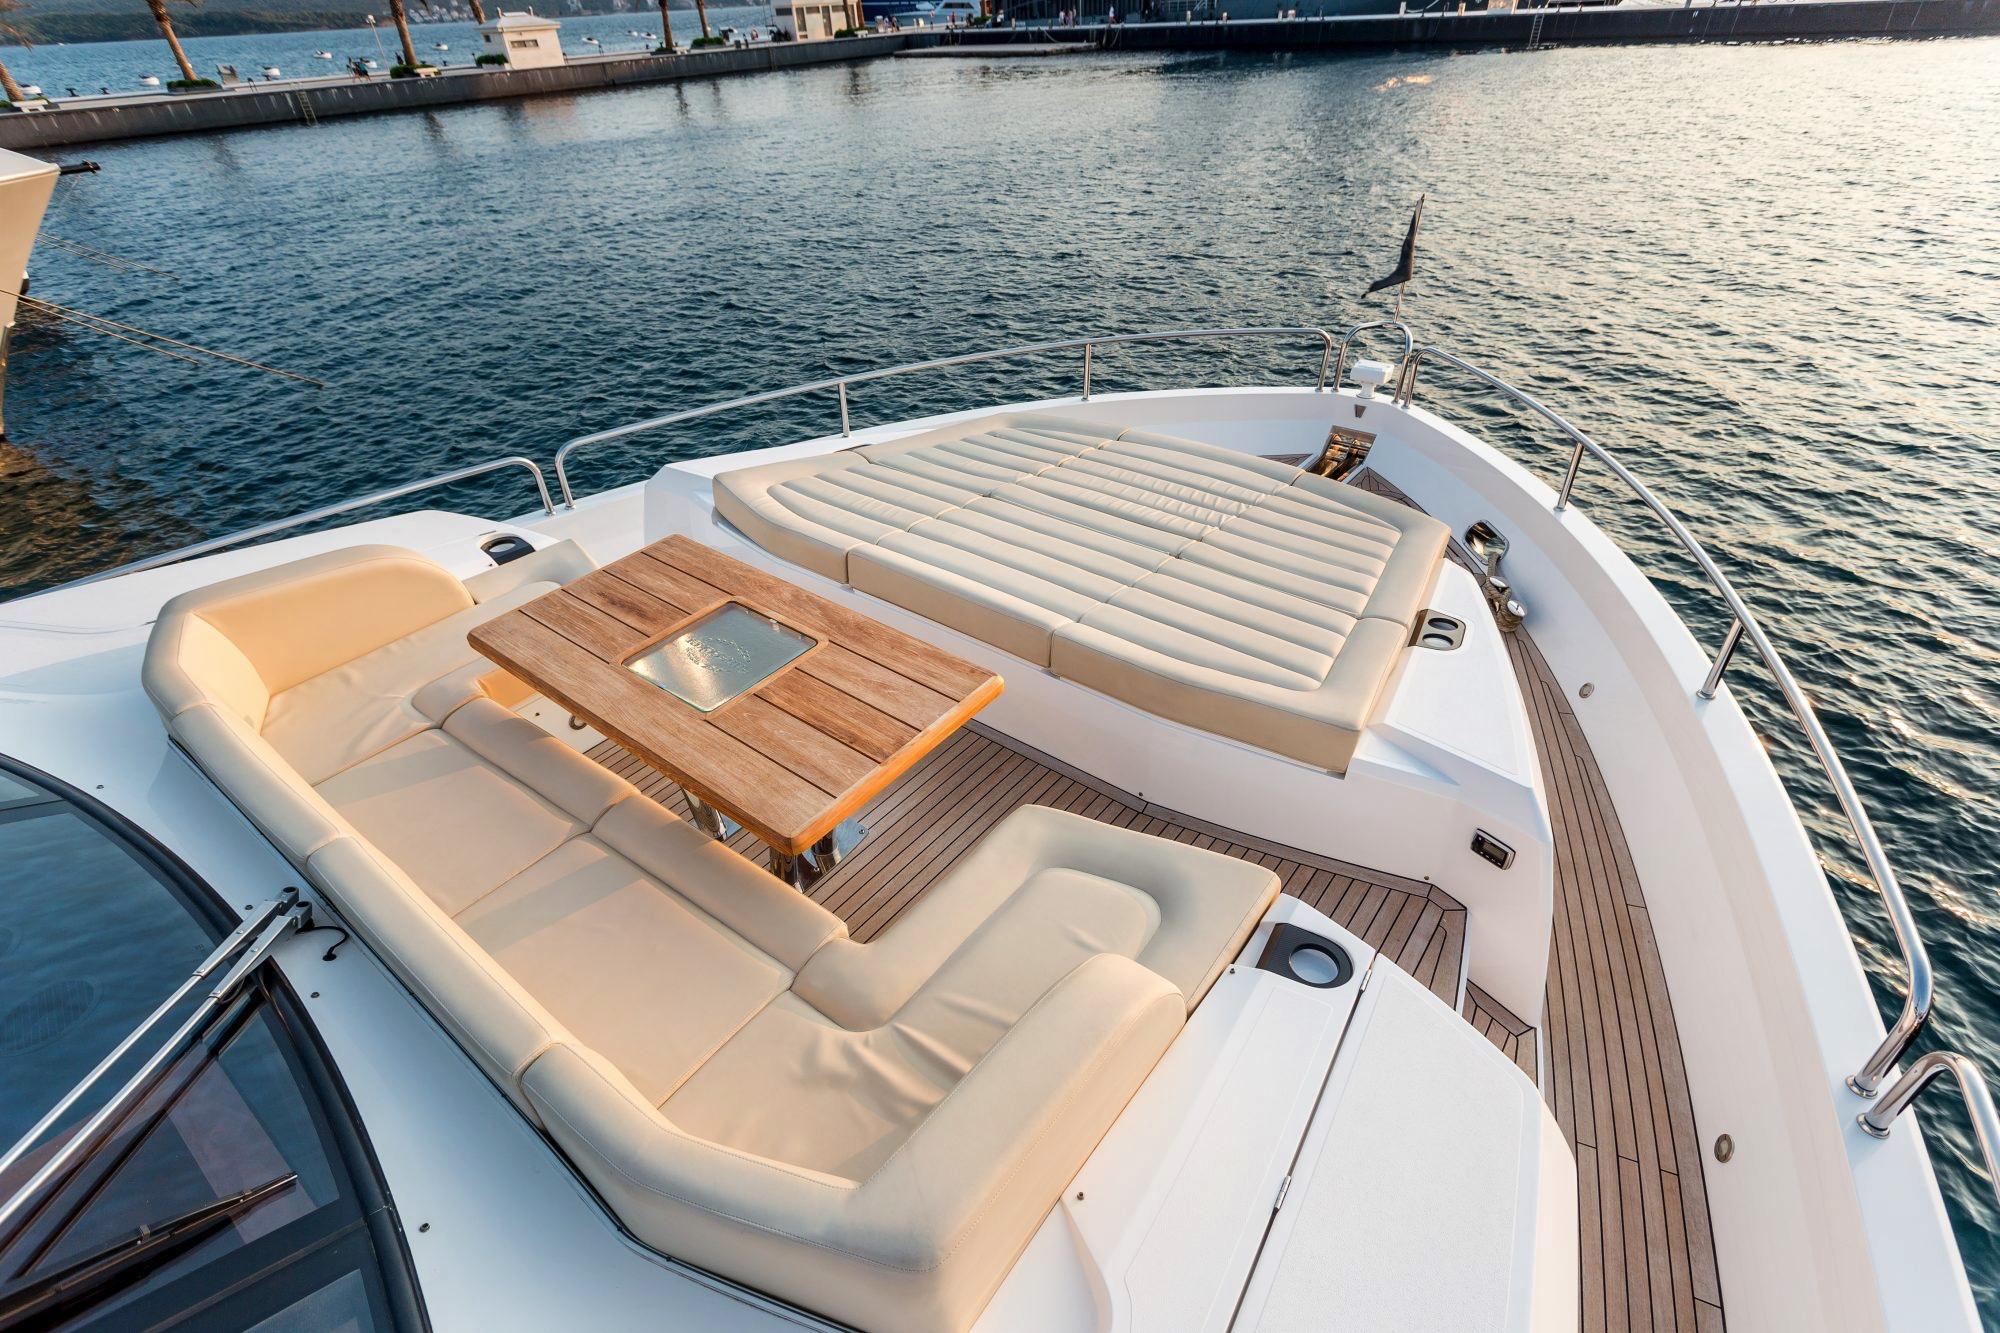 Sunseeker 86 Yacht - Stardust of Poole - Bow 2